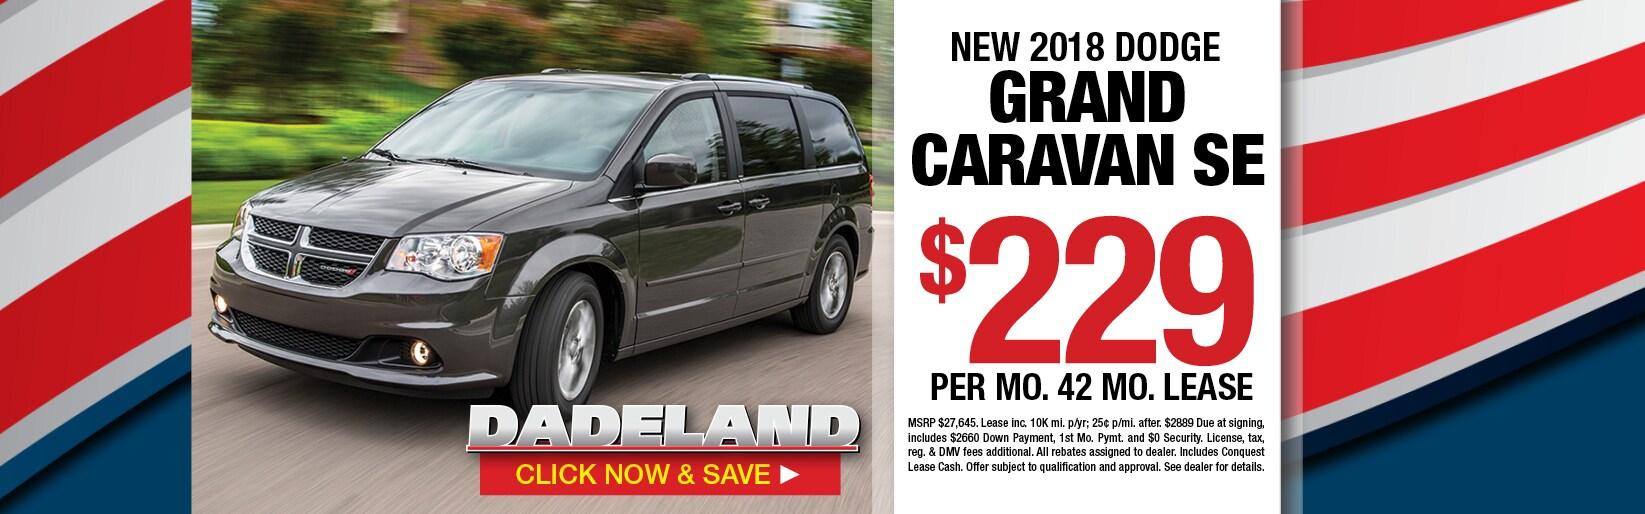 Miami Jeep, Ram, Dodge, Chrysler Dealership | Dadeland